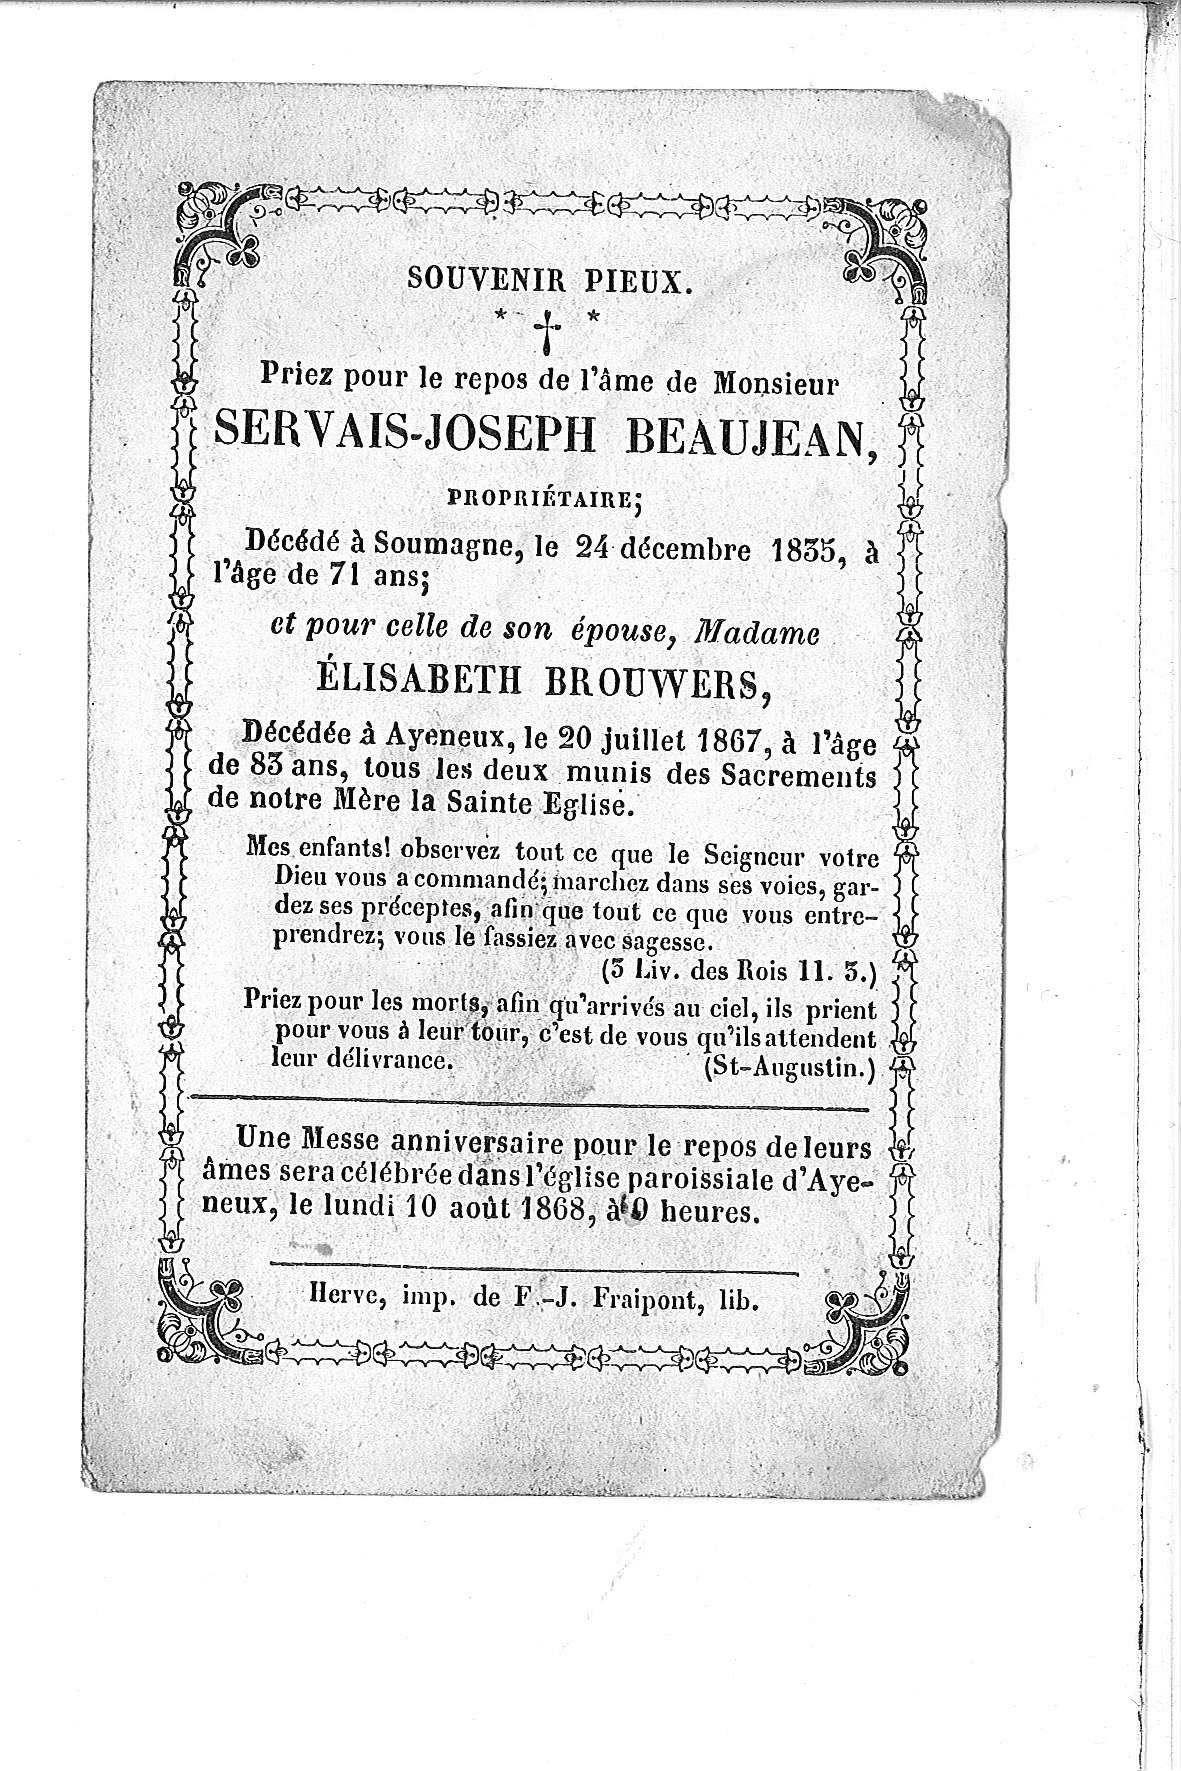 Servais-Joseph(1867)20101117134816_00012.jpg